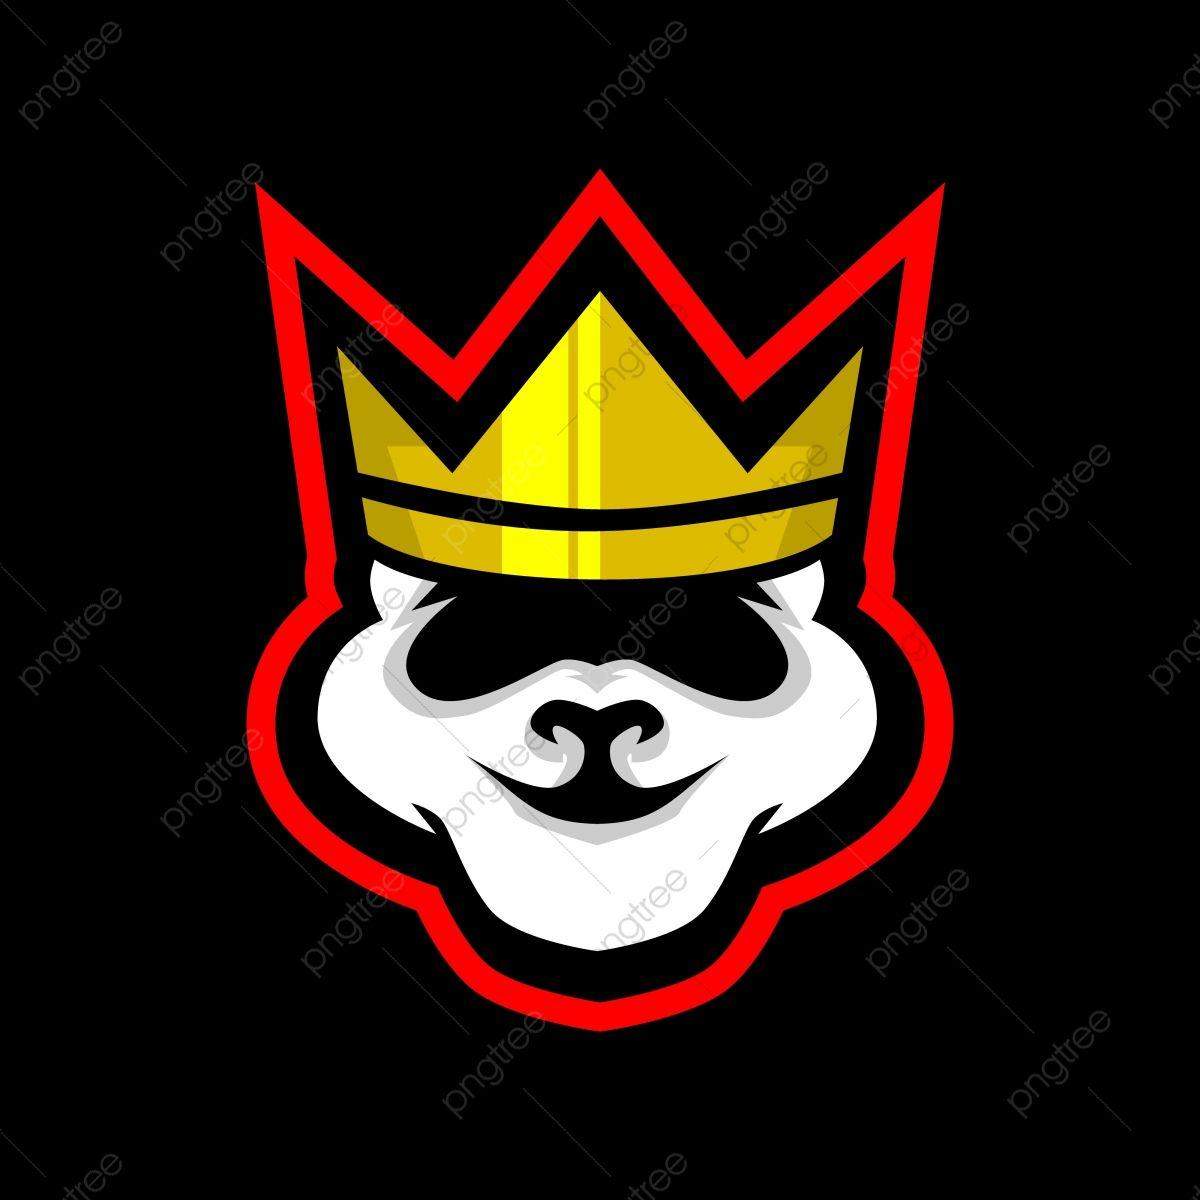 King Panda E Sports Logo Gaming Mascot, Logo Icons, Panda